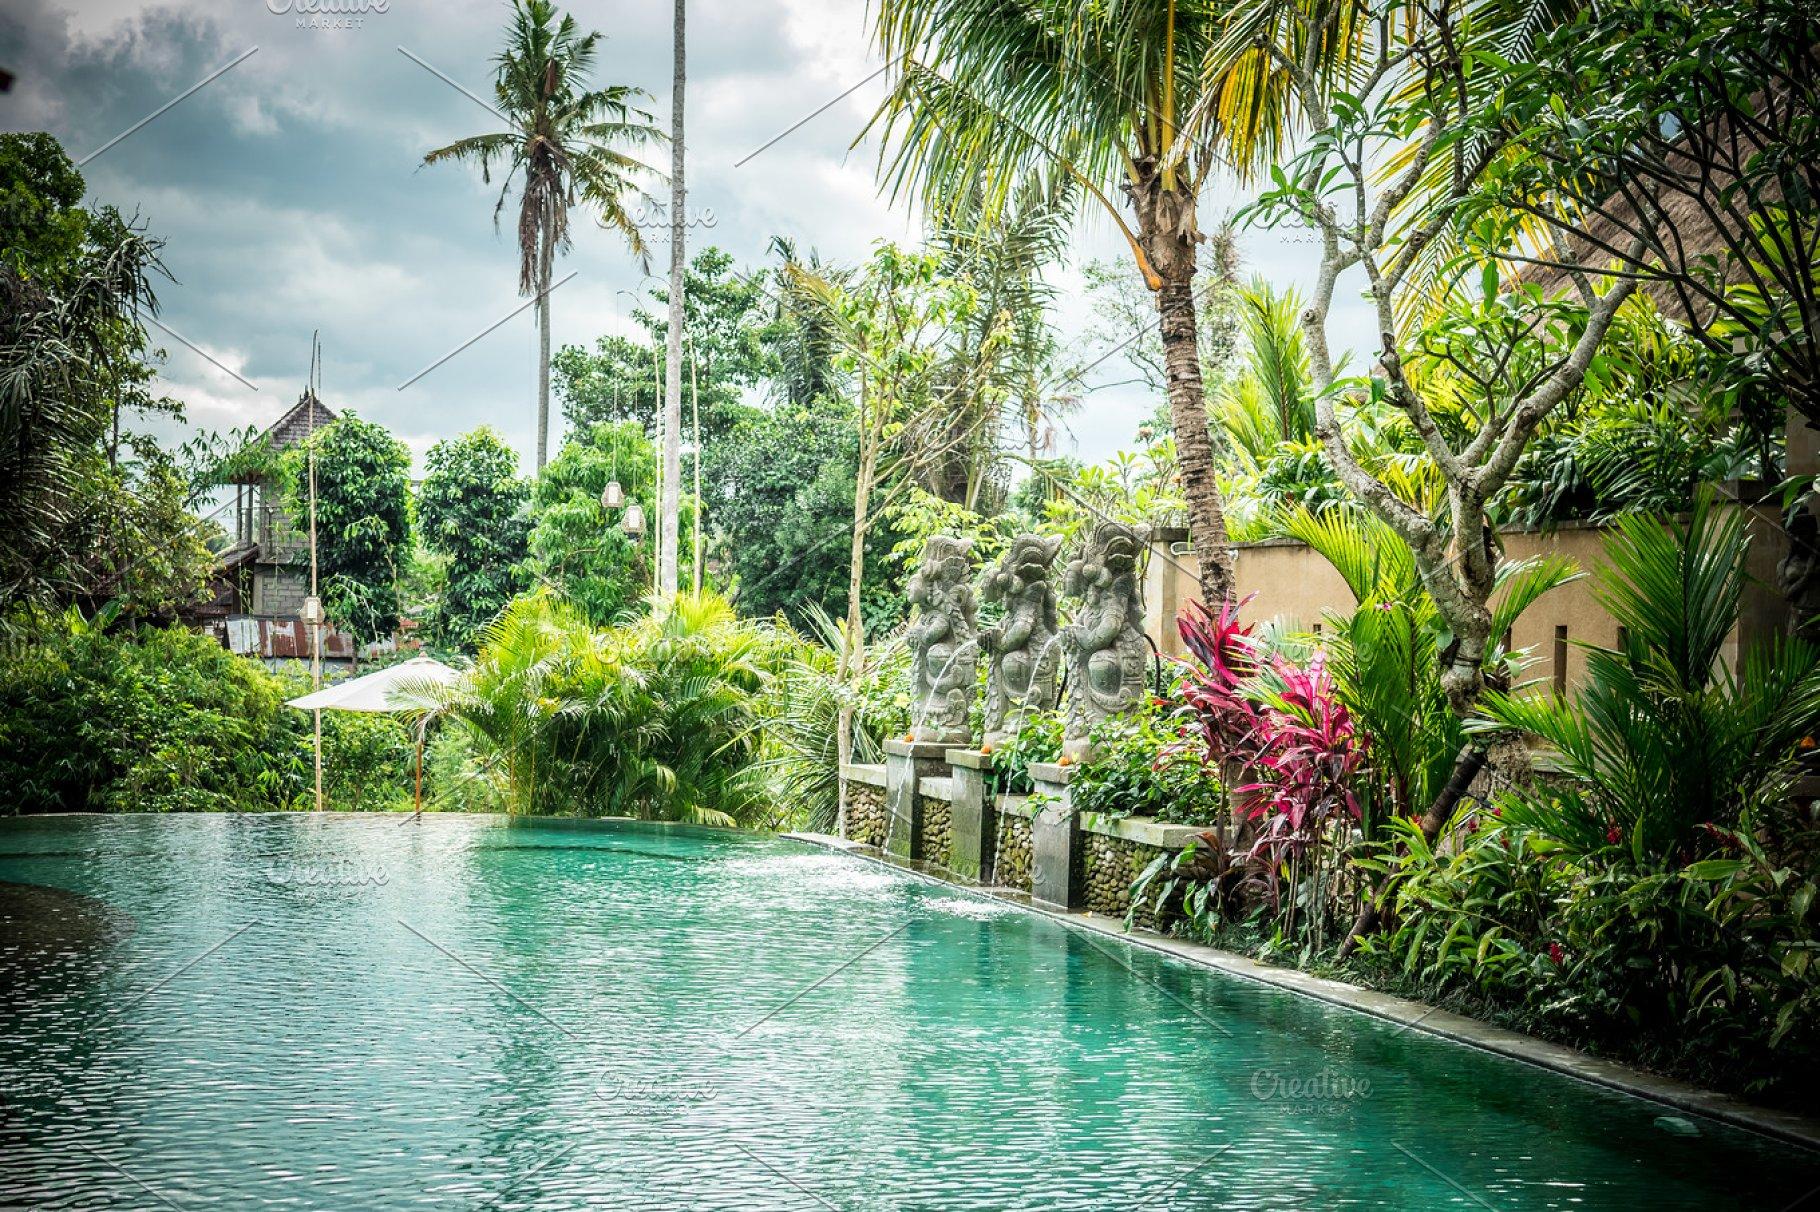 Luxury swimming pool at villa of tropical Bali island, Indonesia.